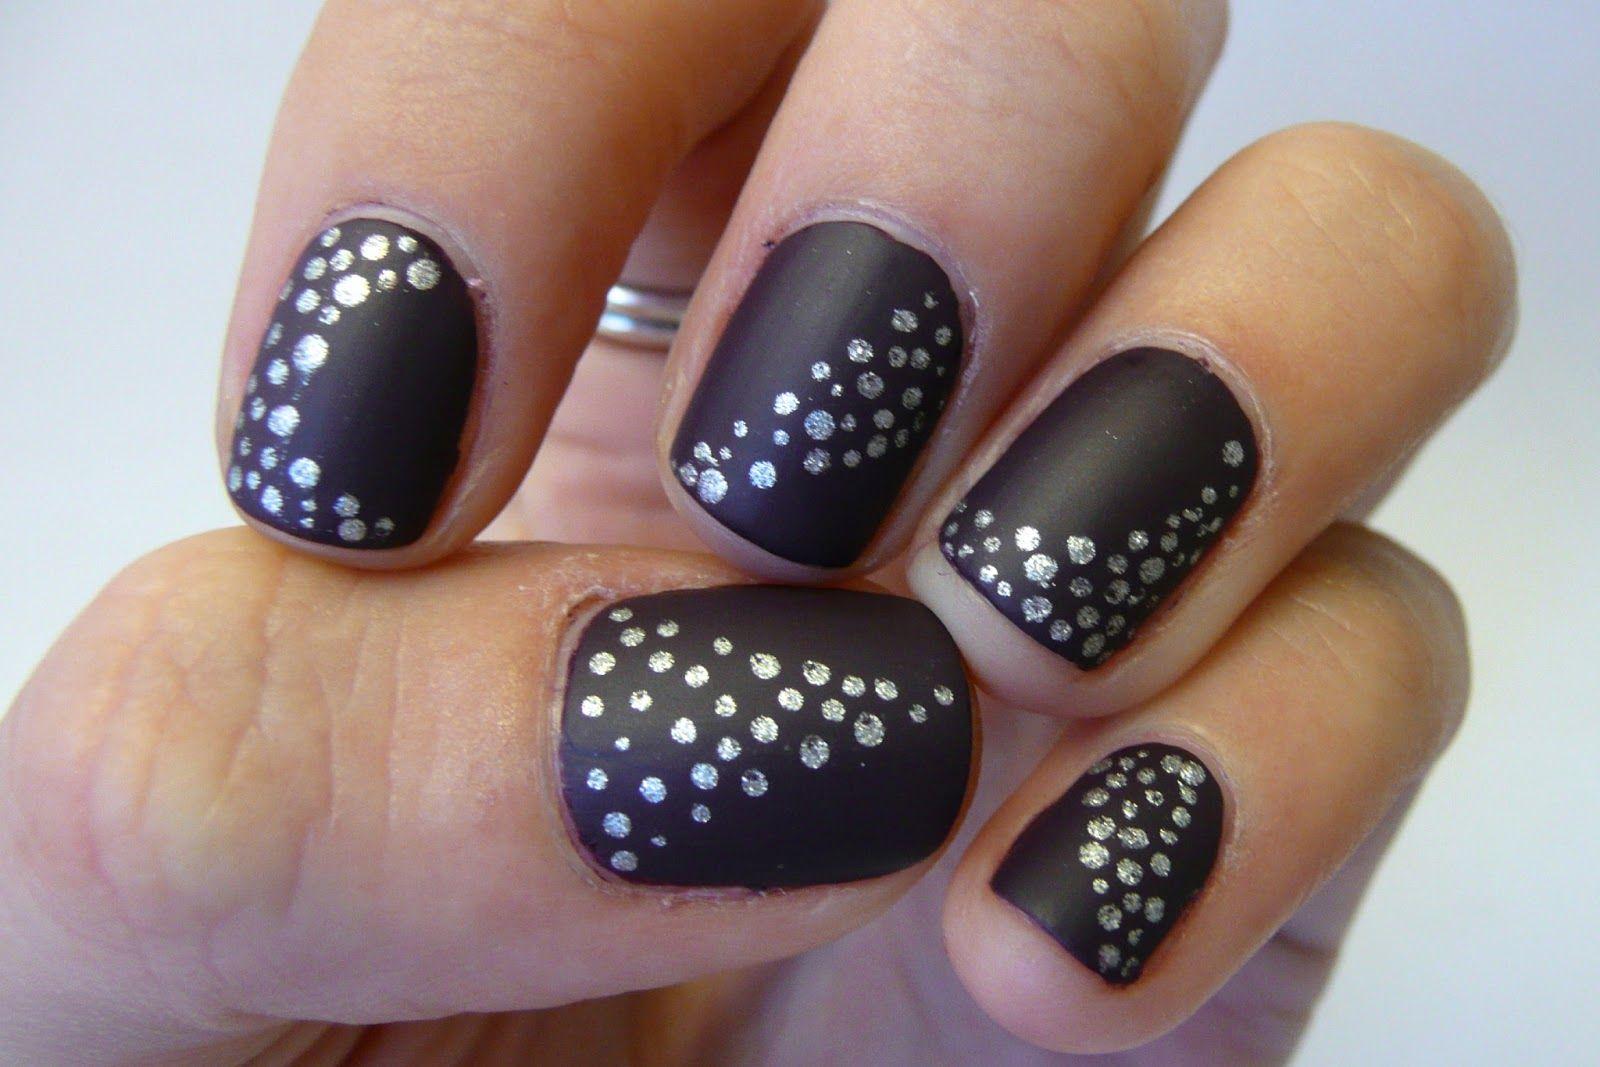 nails-pretty-patterns-try-this-easy-matte-black-nail-polish-design ...